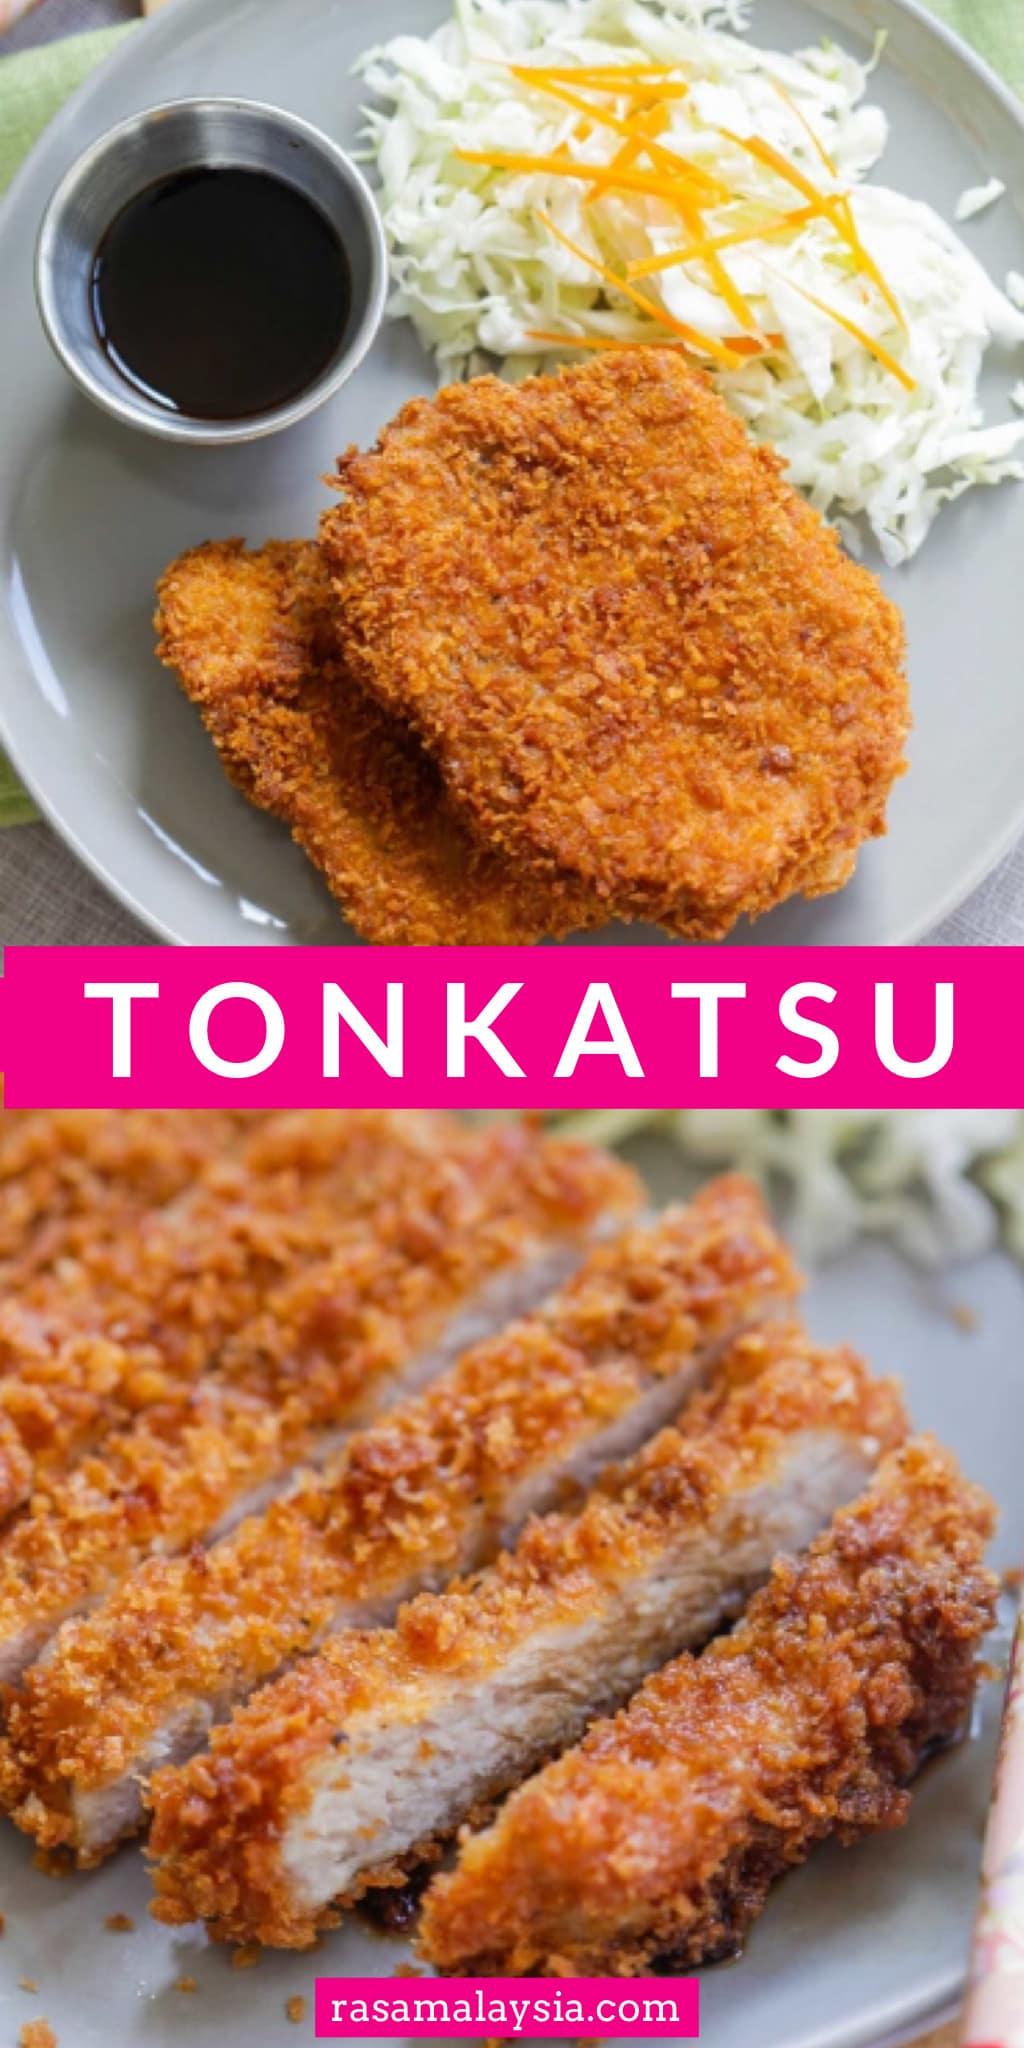 Tonkatsu is crispy and crunchy Japanese fried pork cutlet with panko bread crumbs. This homemade tonkatsu recipe is so easy and tastes like restaurants.